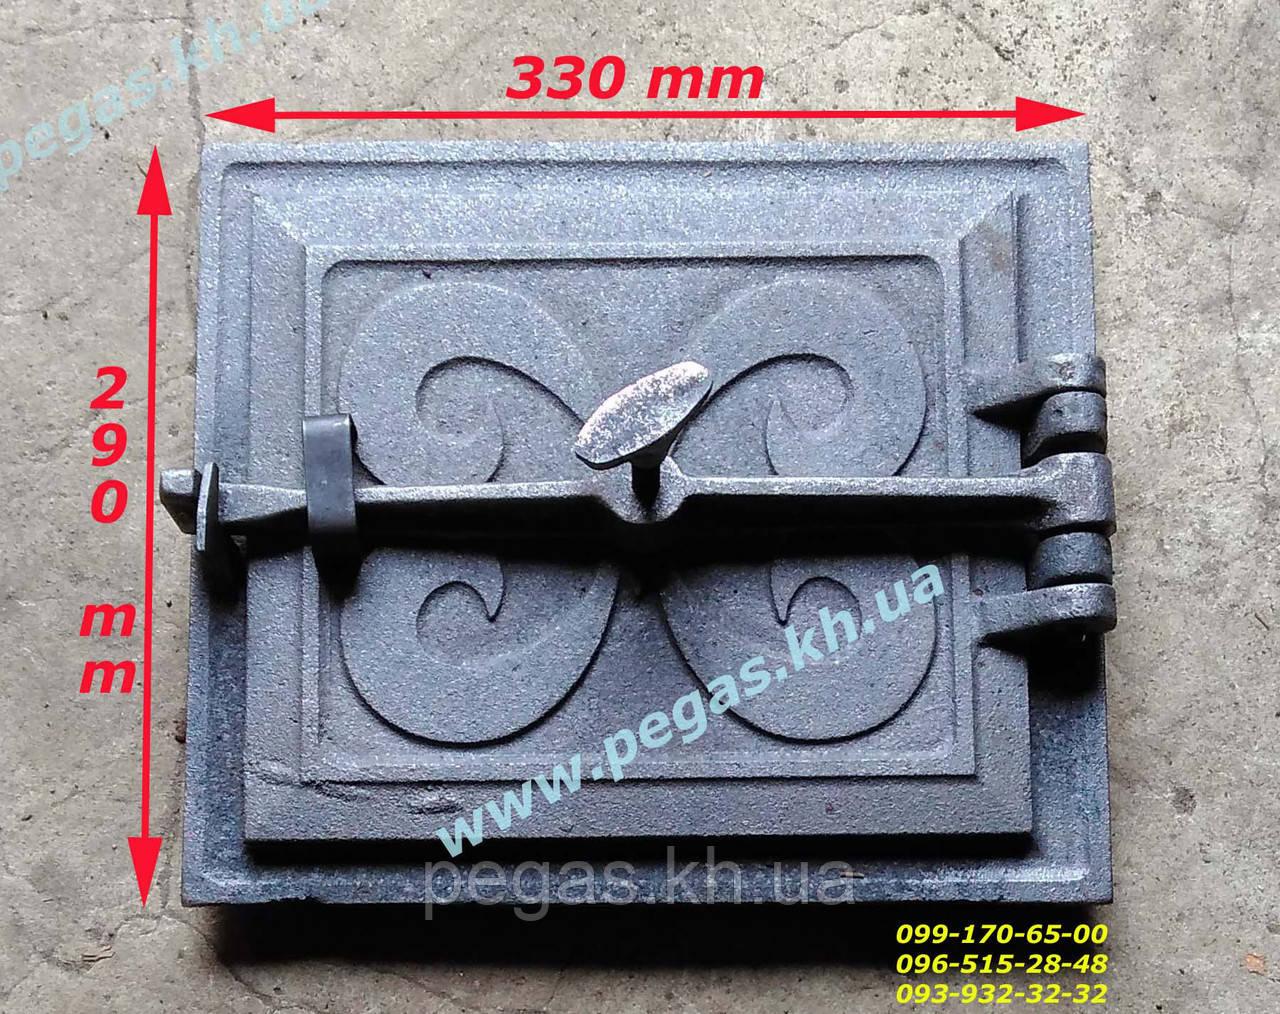 Дверка чугунная (240х275 мм) печи, грубу, барбекю, мангал